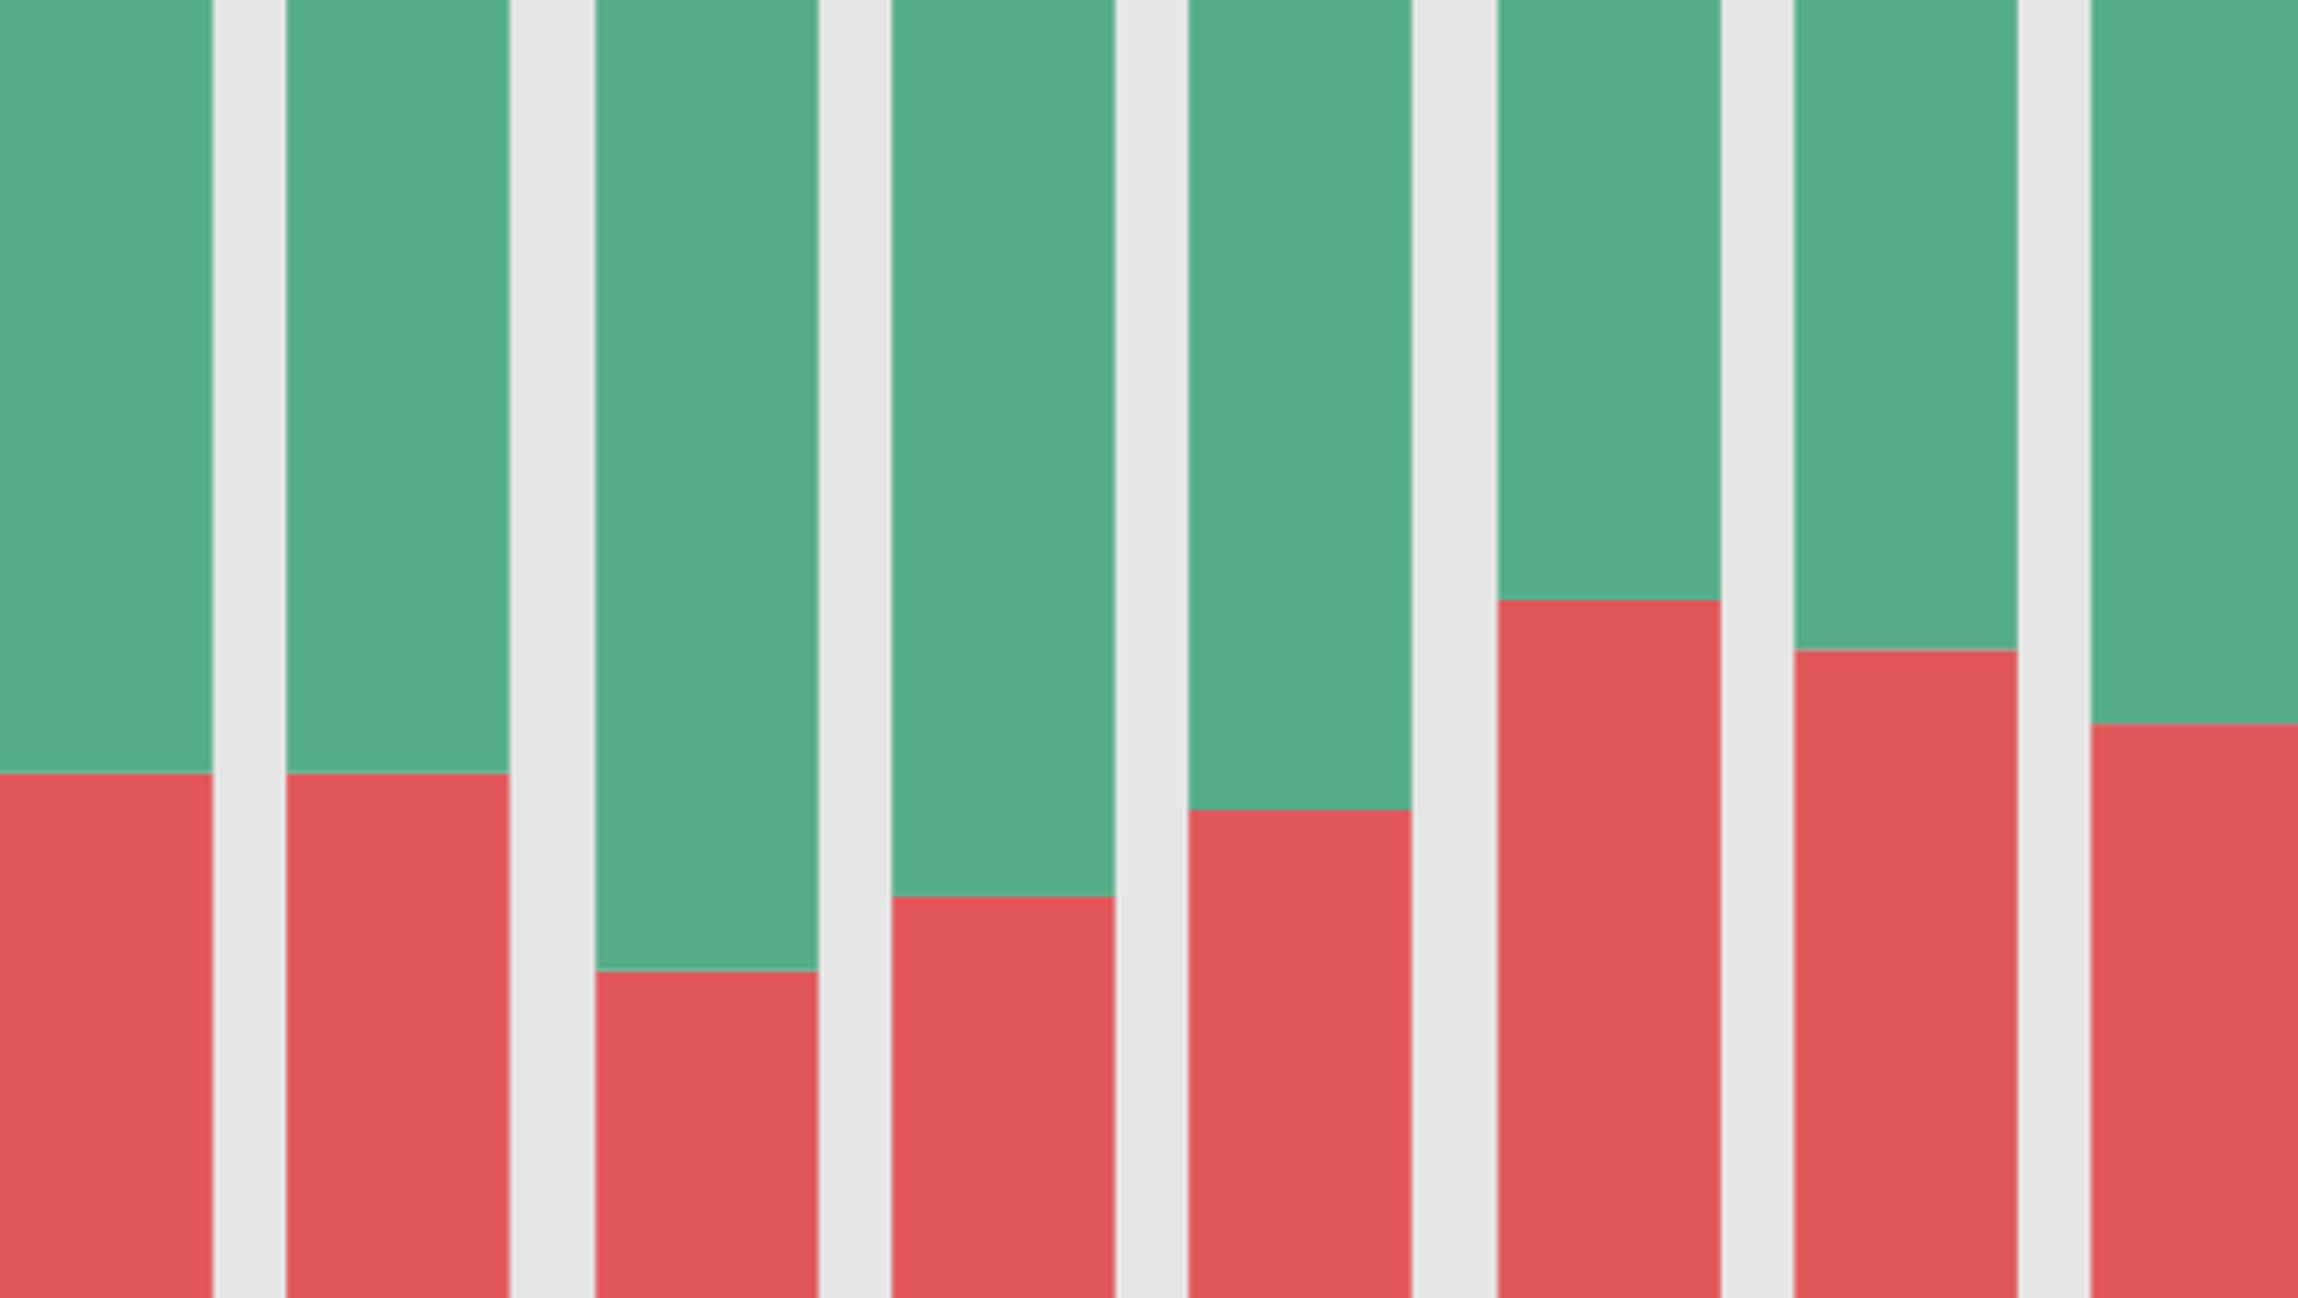 Stacked bar chart comparing real and fake Christmas tree sales